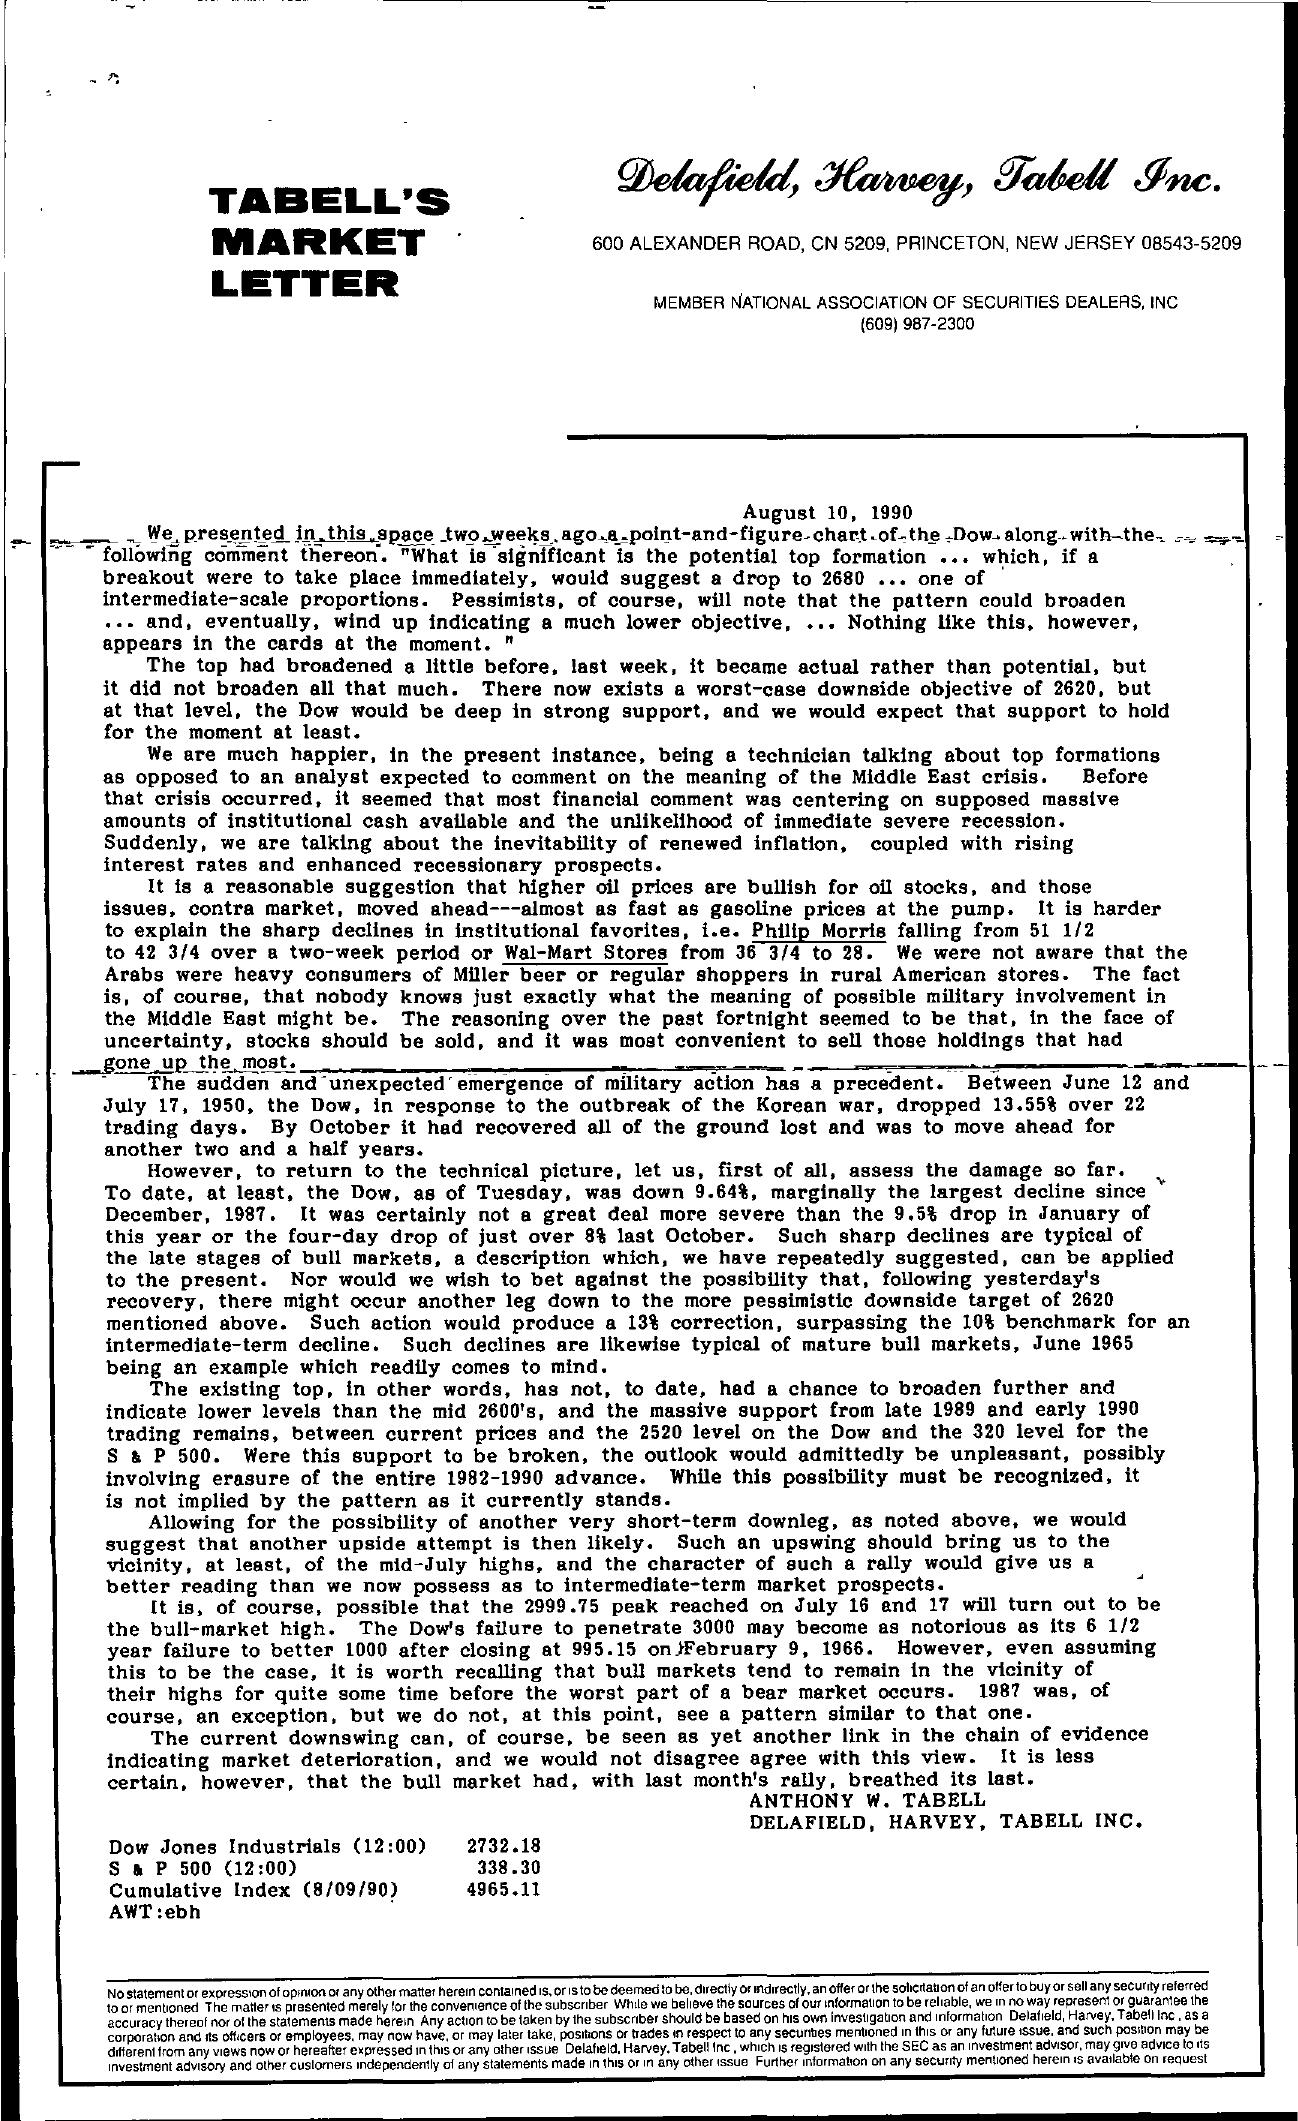 Tabell's Market Letter - August 10, 1990